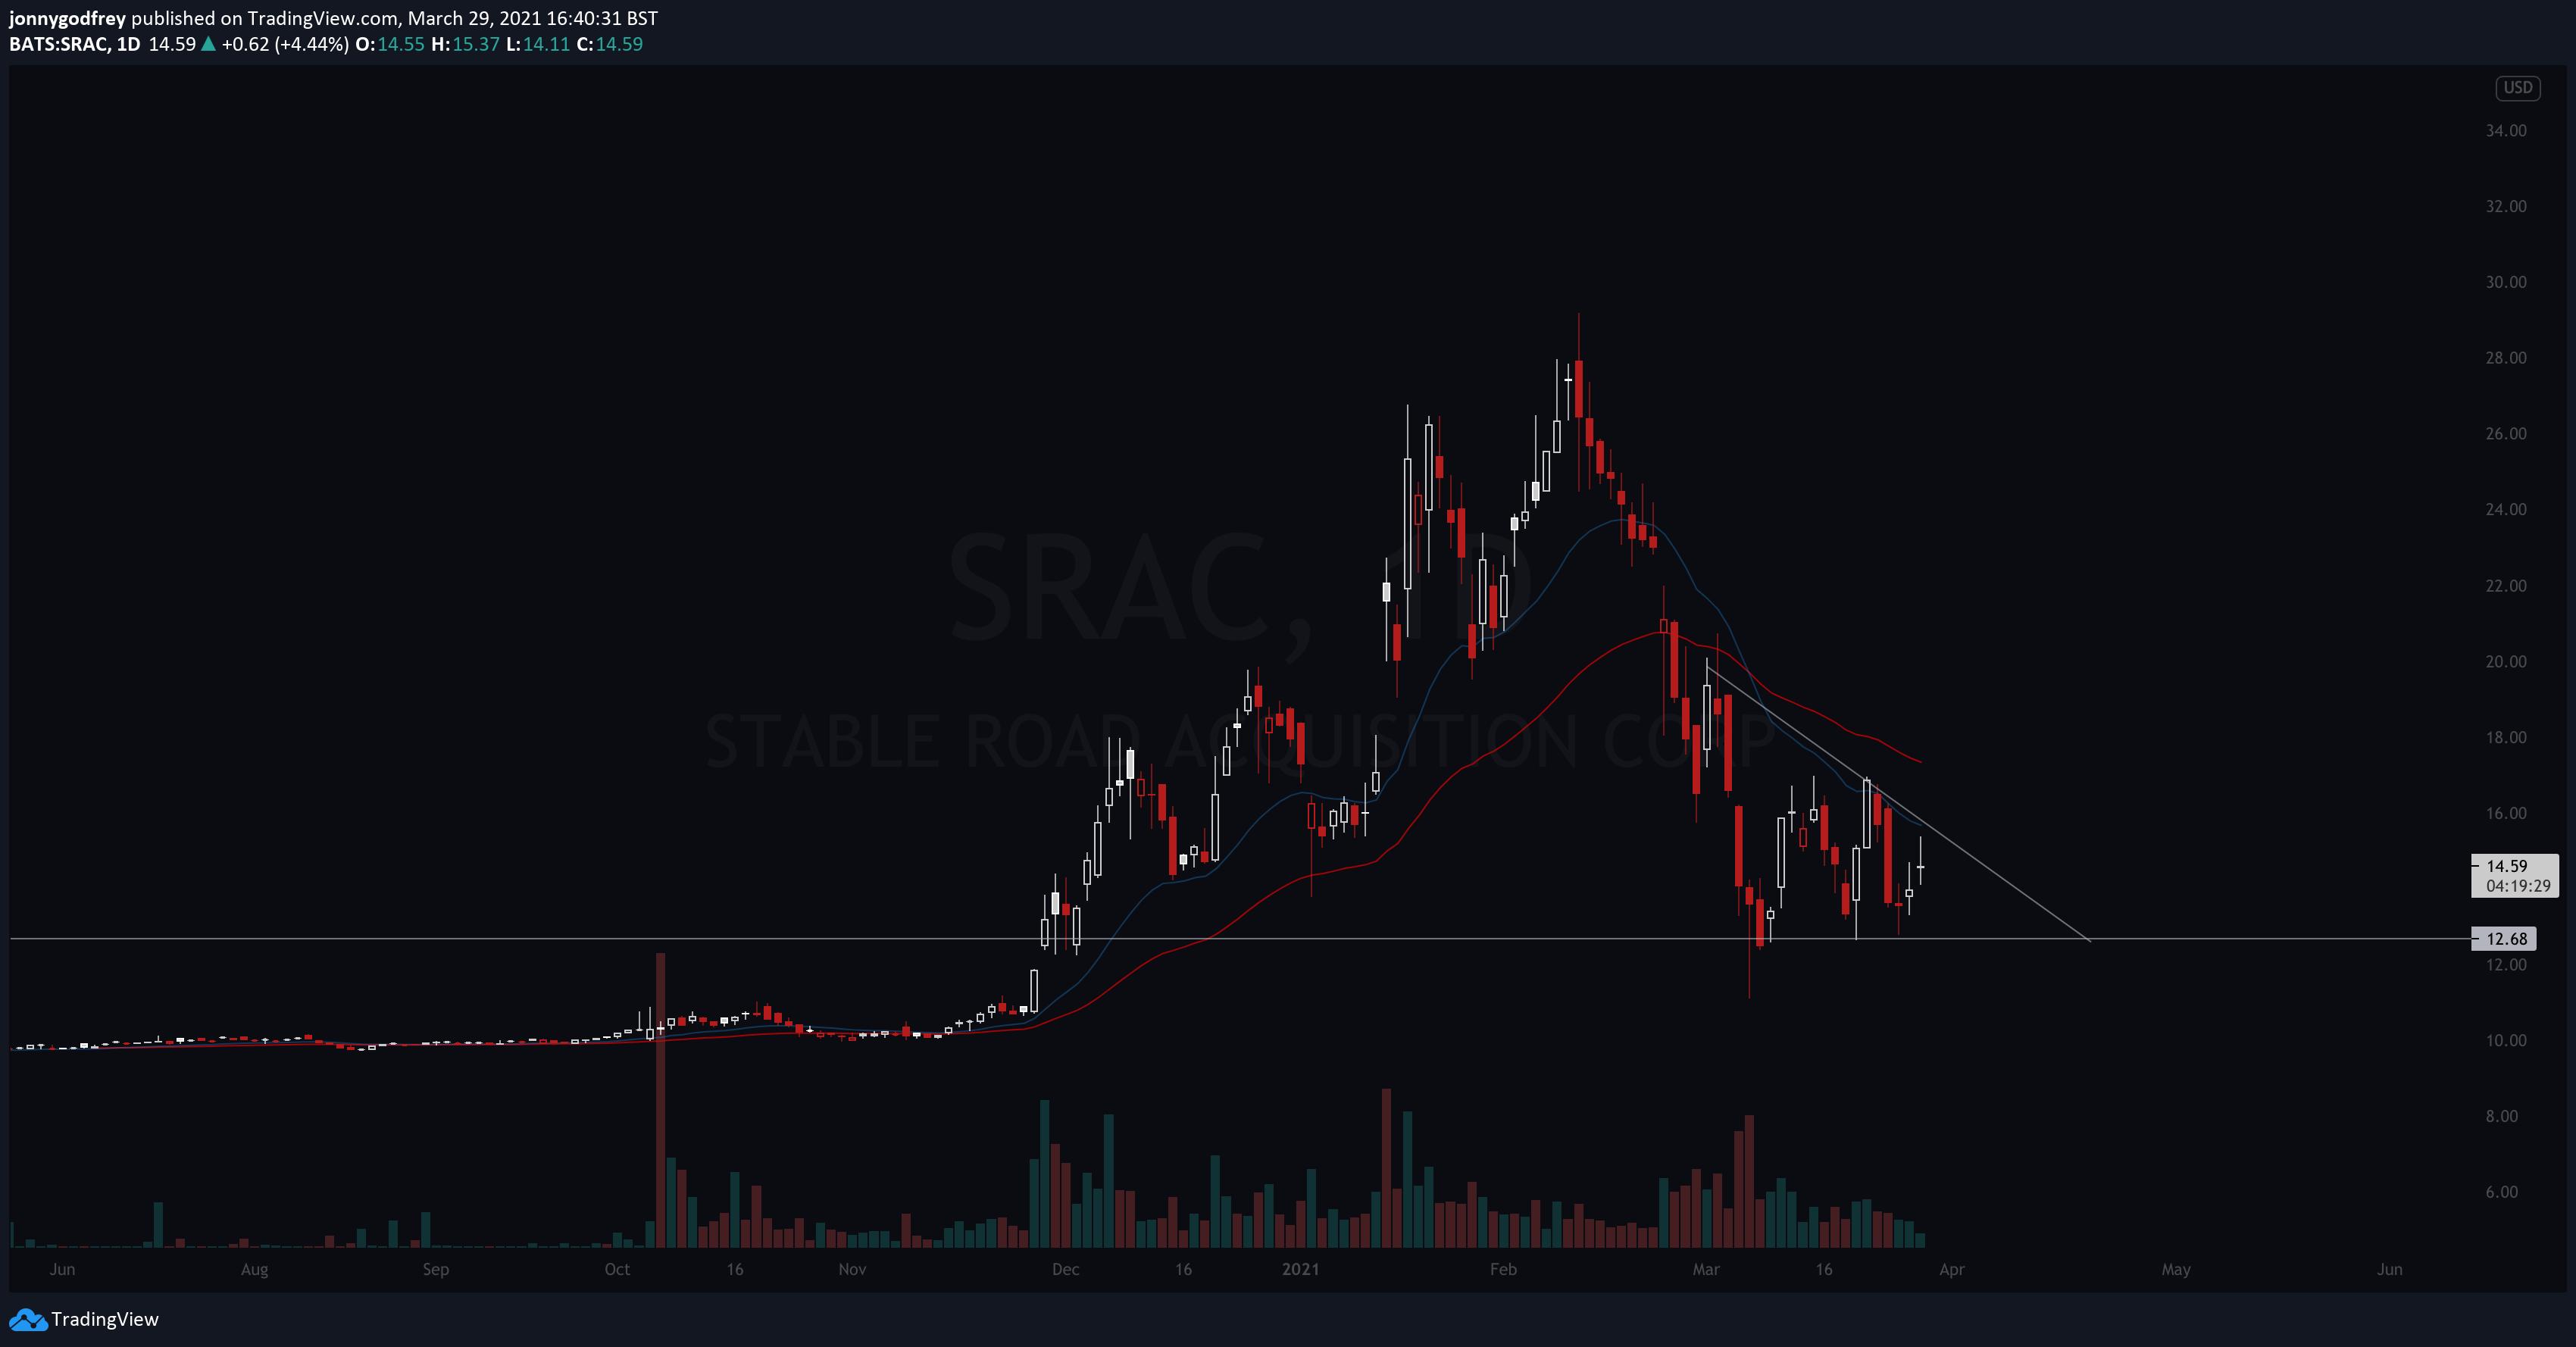 SRAC daily chart